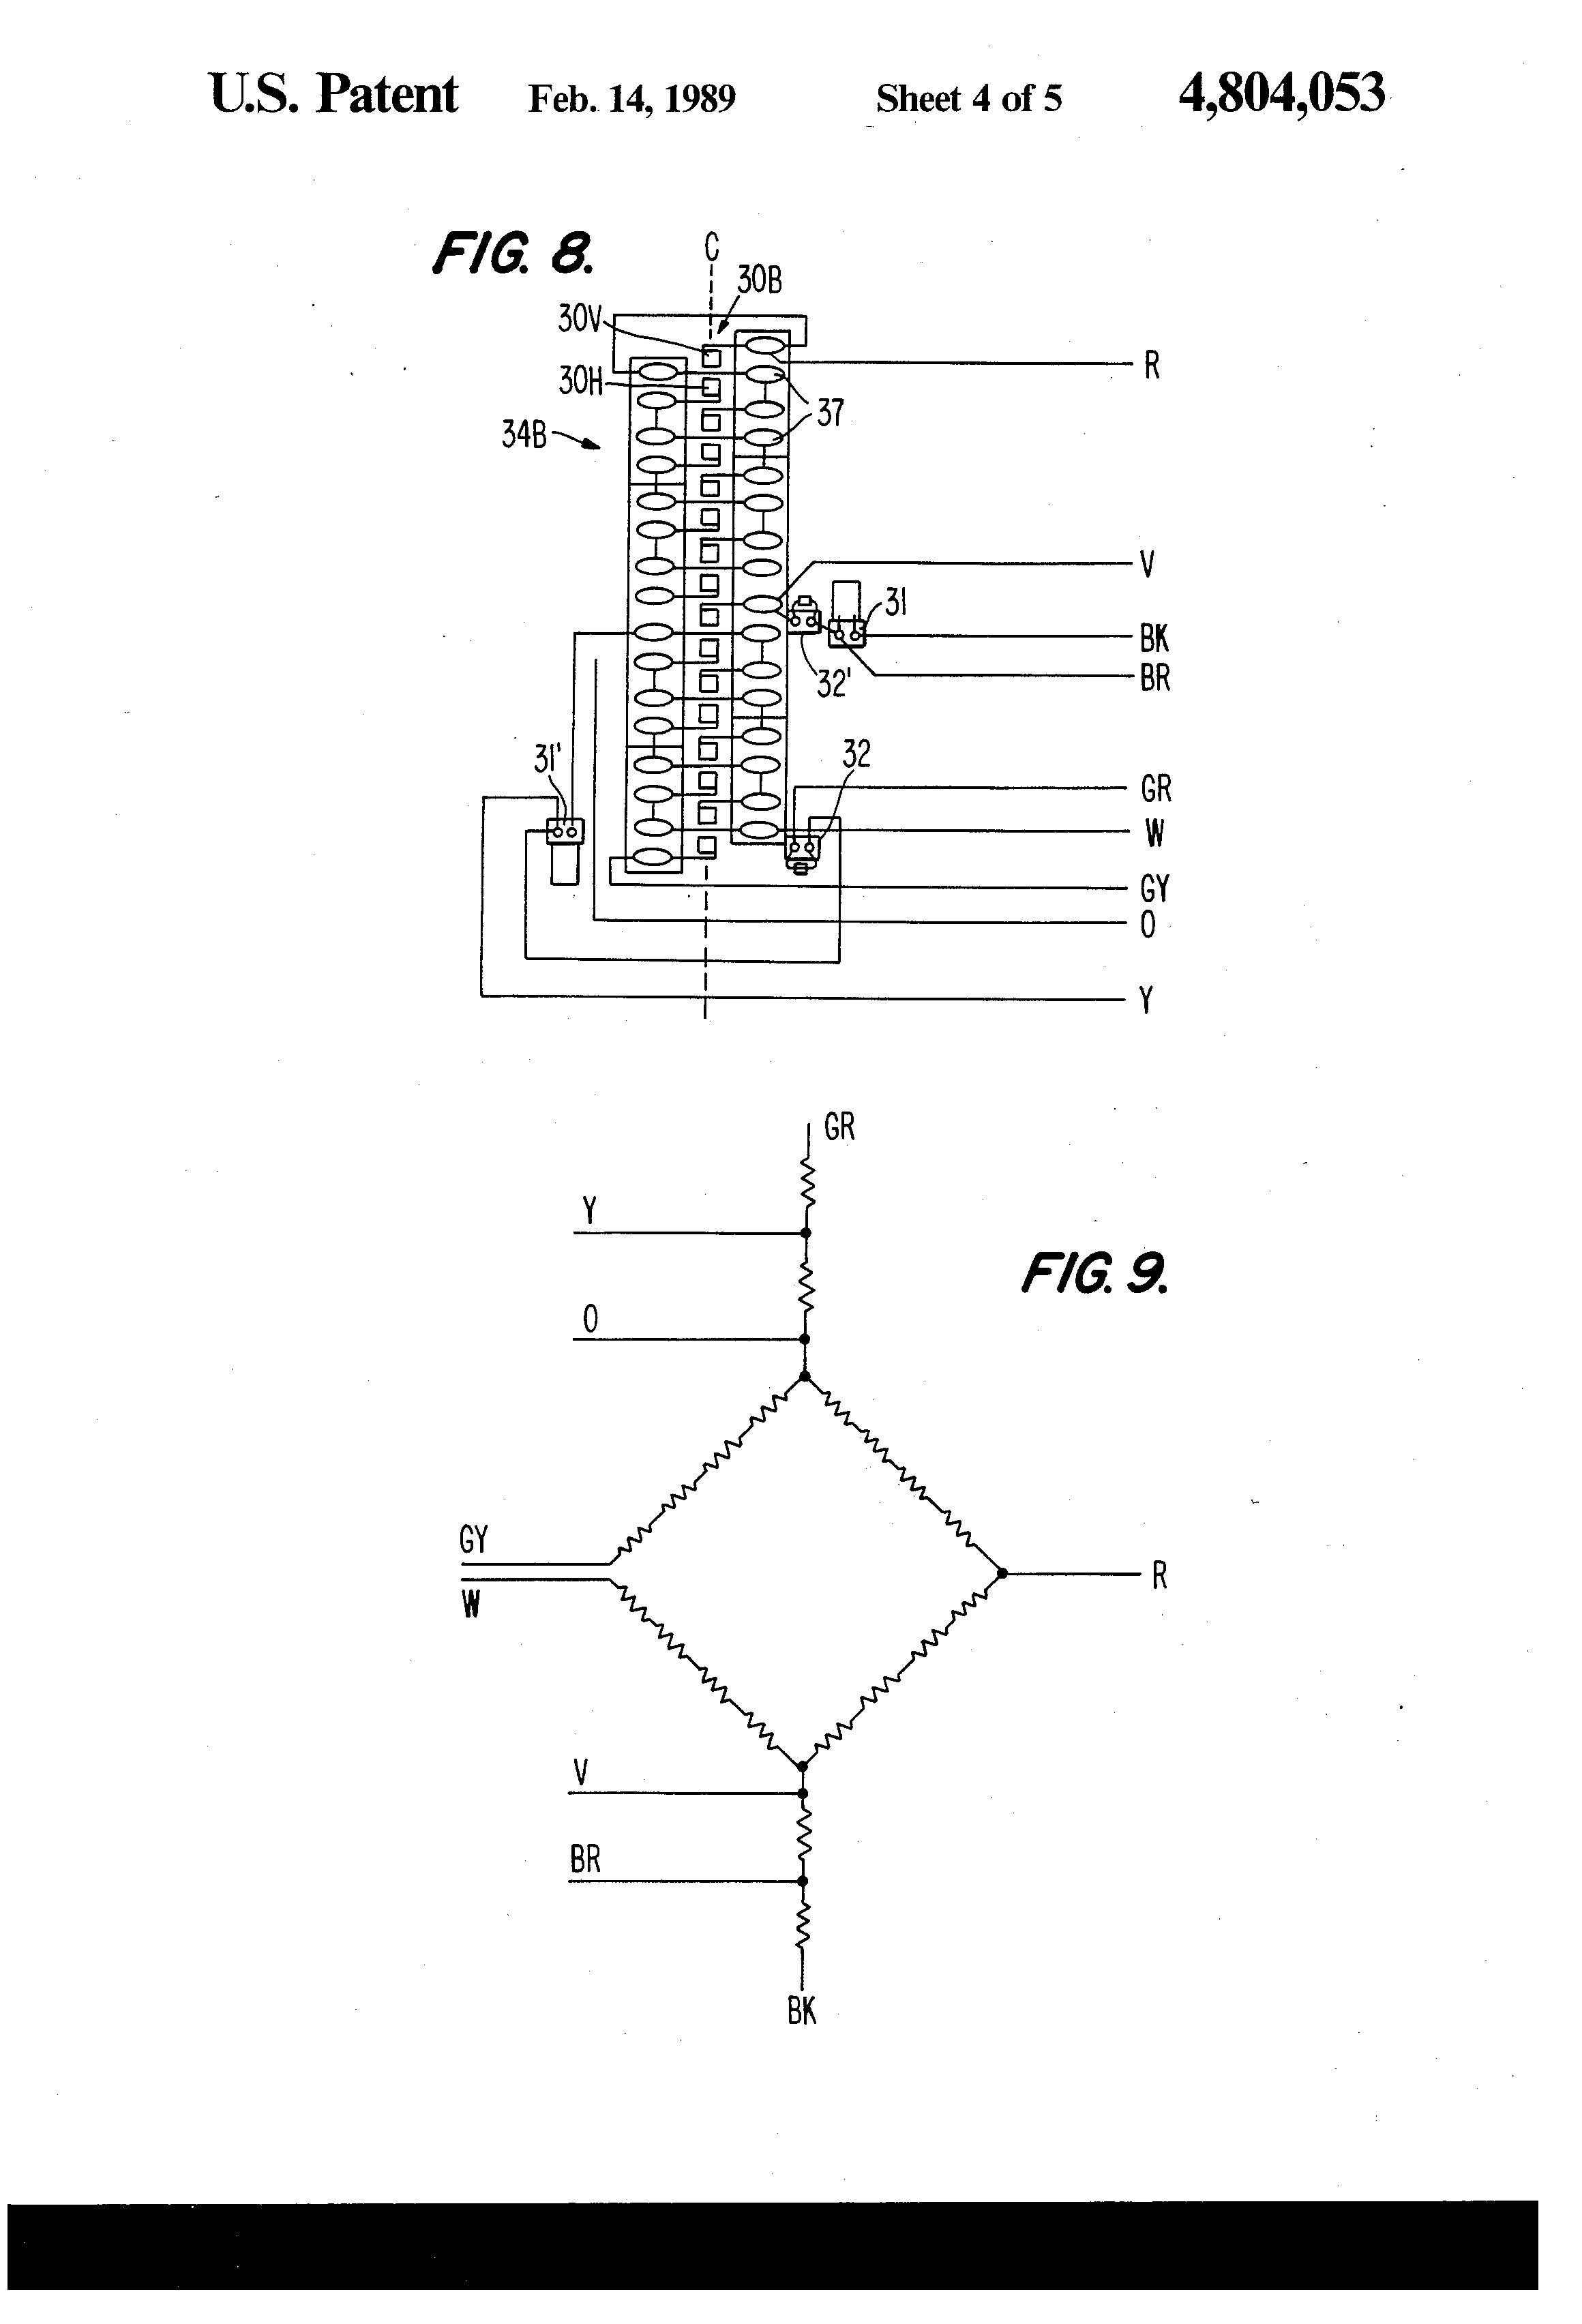 Patent Us Rocker Pin Load Cell Google Patents Drawing variable resistor pnp transistor